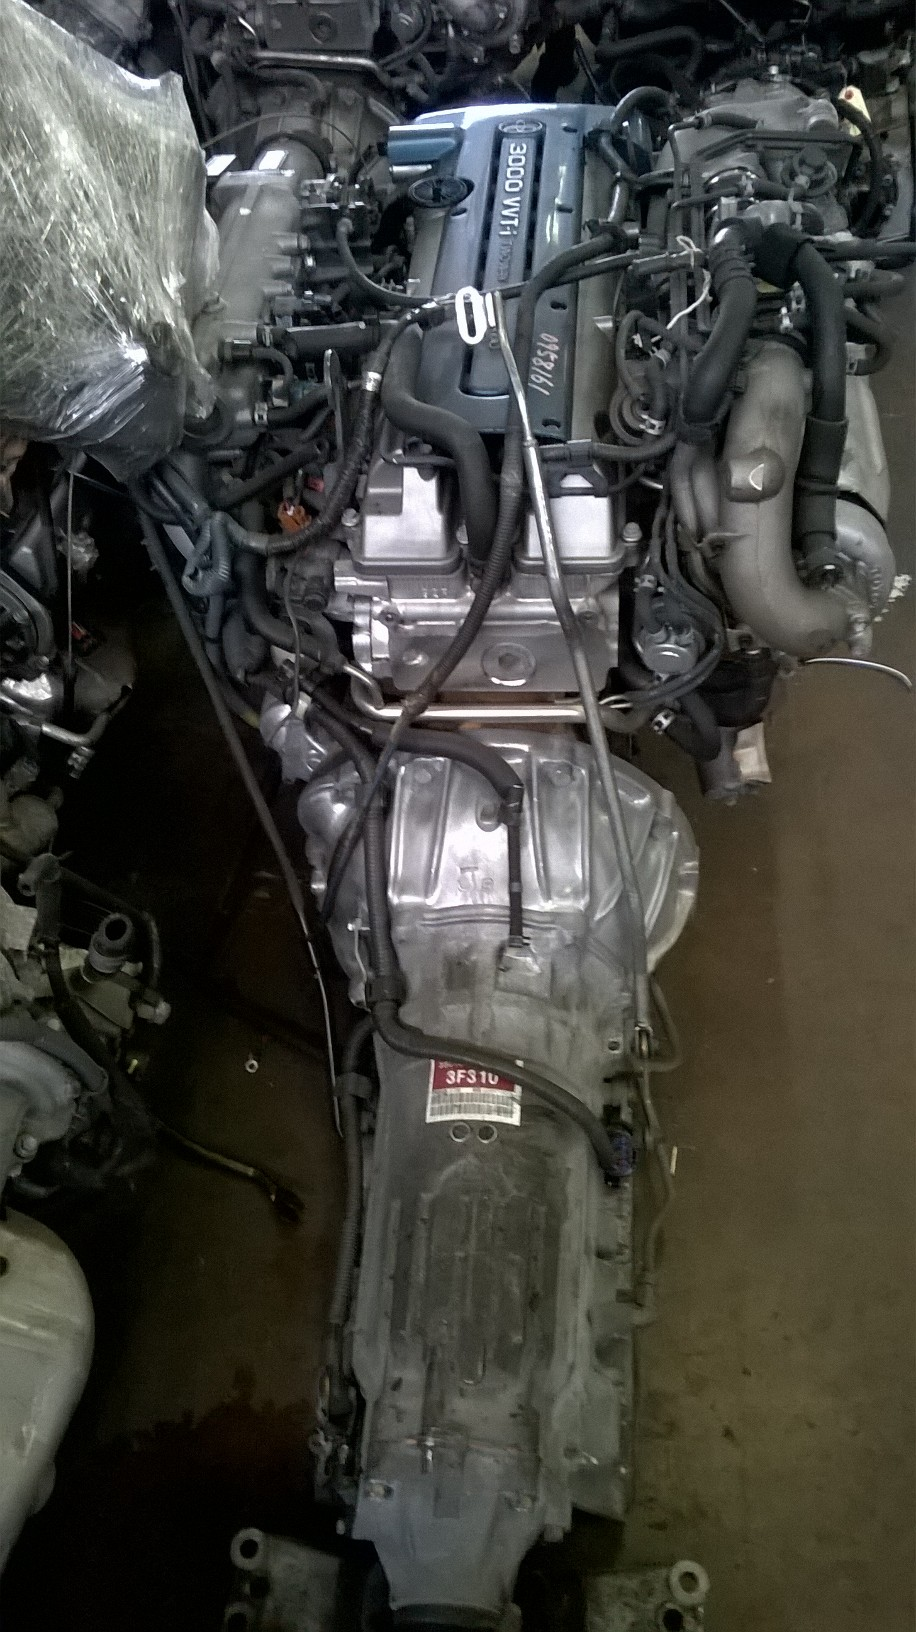 Toyota Supra 3.0 VVTi Twin Turbo Engine & Auto Gearbox  # 2JZ